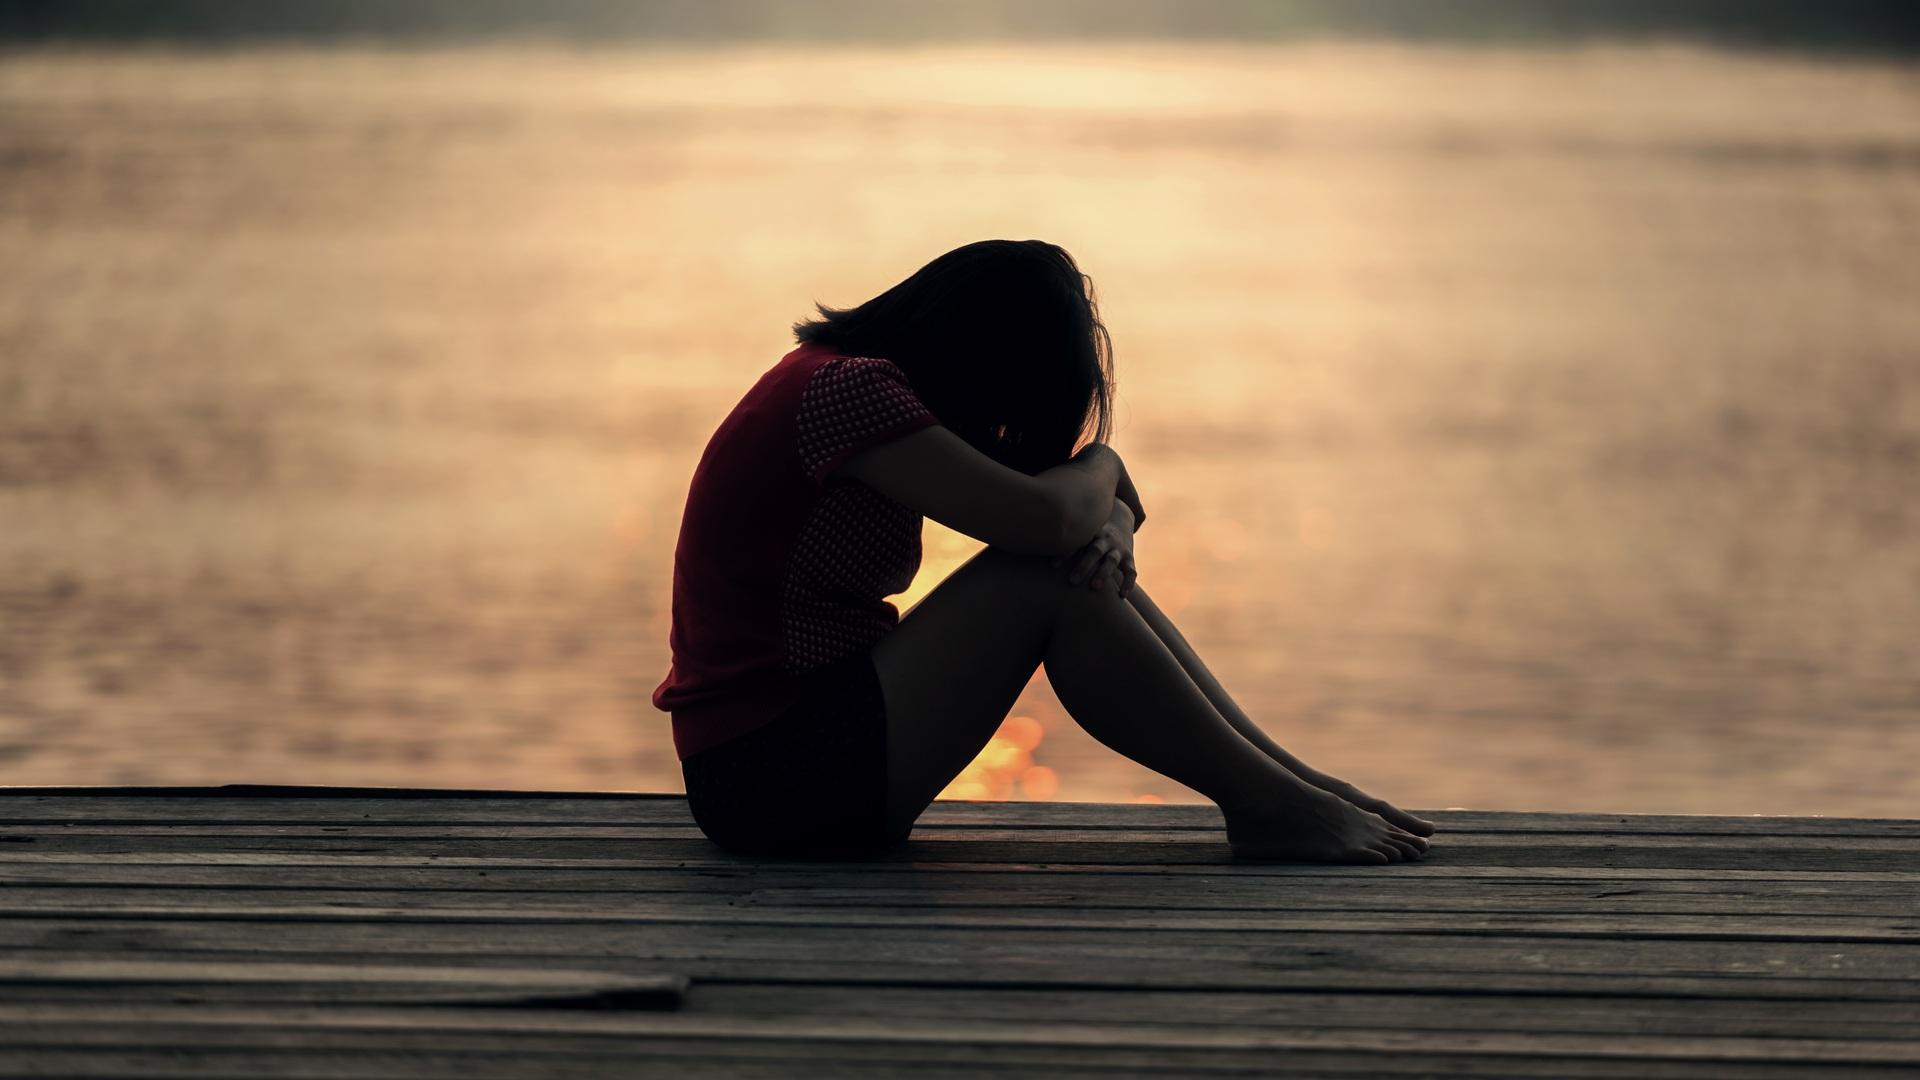 1920x1080 Sad Girl Sitting On Dock Silhouette Laptop Full Hd 1080p